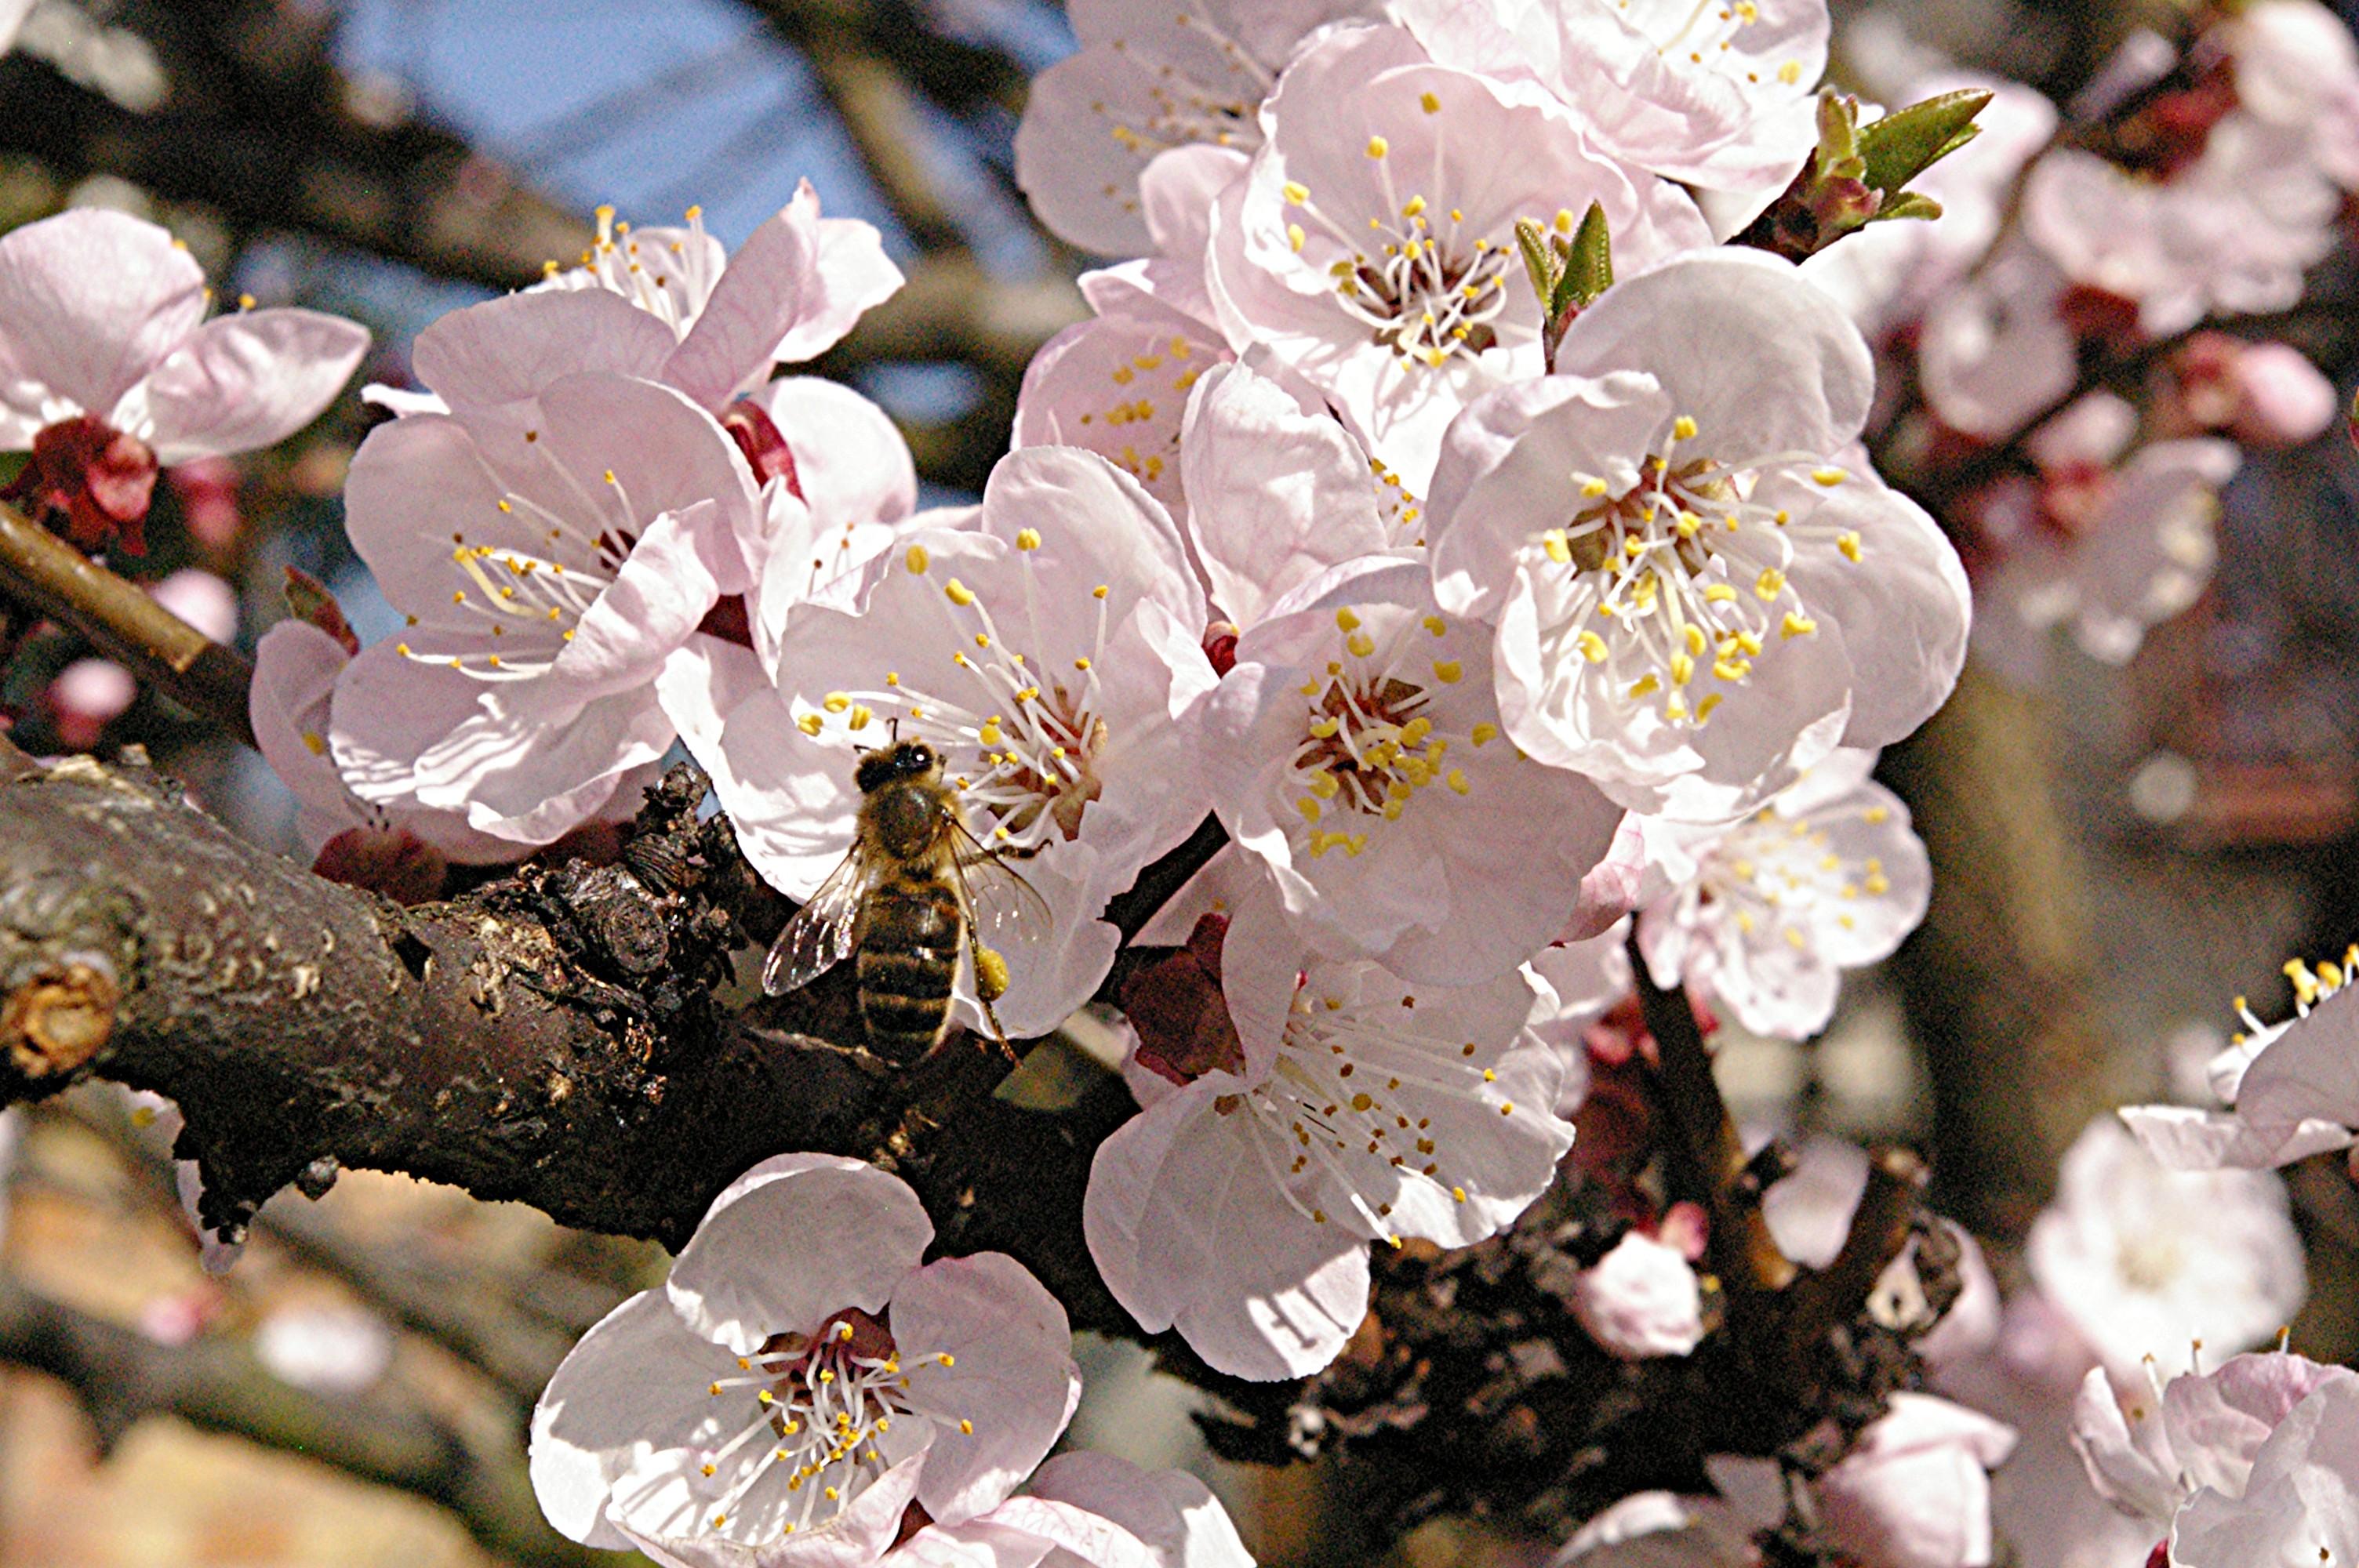 abricotier 19 03 2009 2 015-1